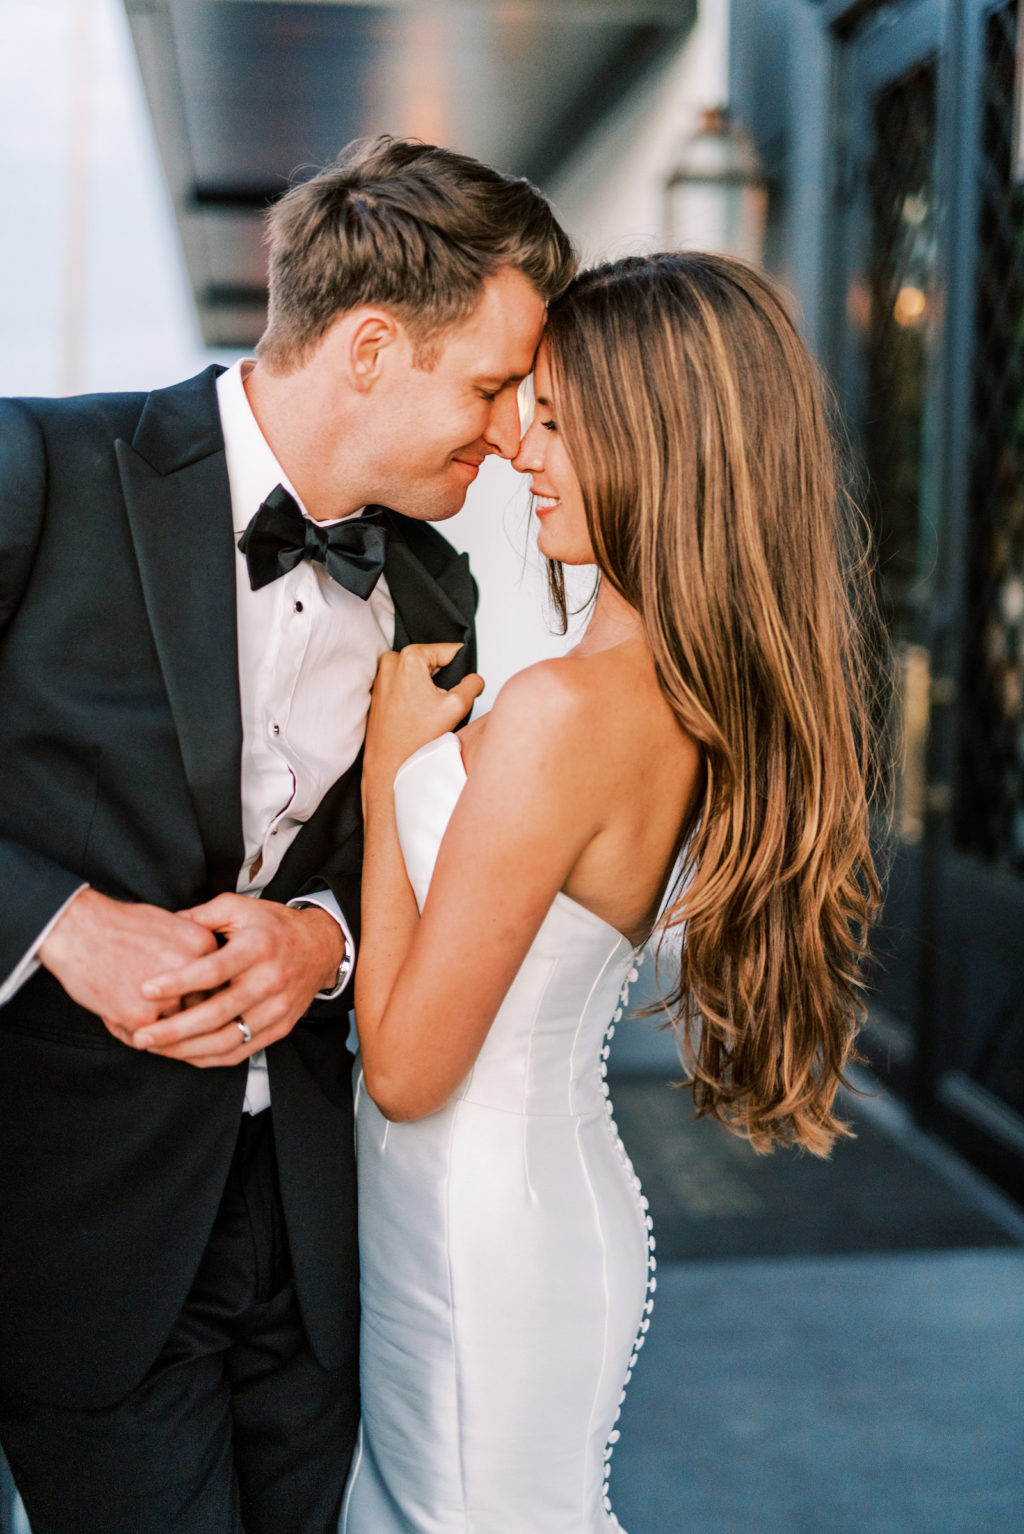 Romantic Classic Bride and Groom in Black Tuxedo Wedding Photo | Tampa Bay Wedding Photographer Kera Photography | Wedding Hair and Makeup Femme Akoi Beauty Studio